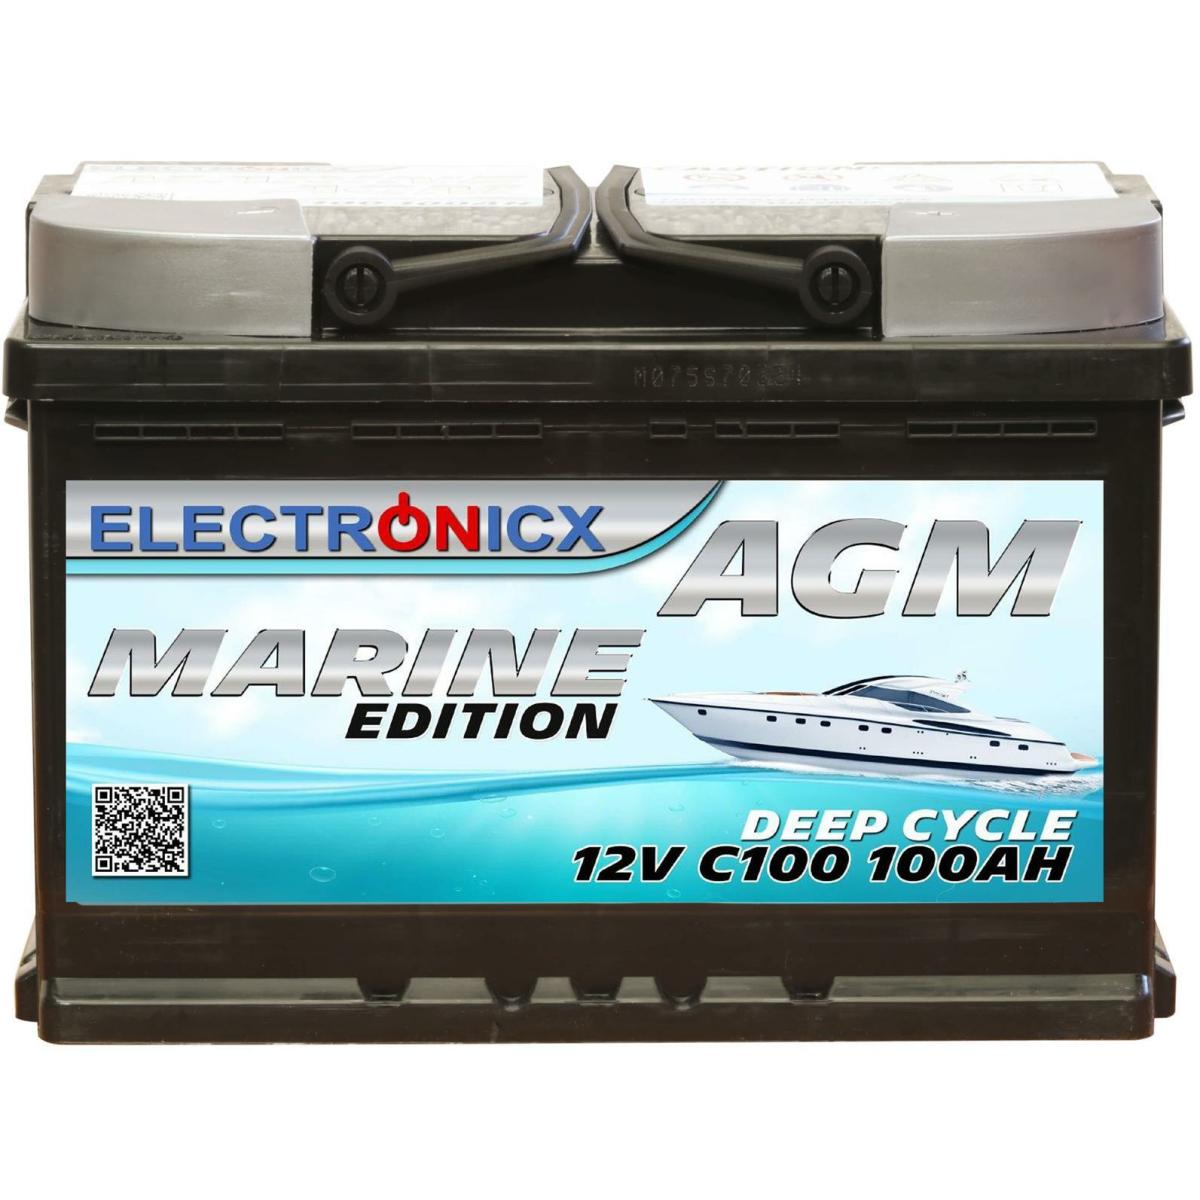 Electronicx Marine Edition Batterie AGM 100 AH 12V Boot Schiff Versorgungsbatterie